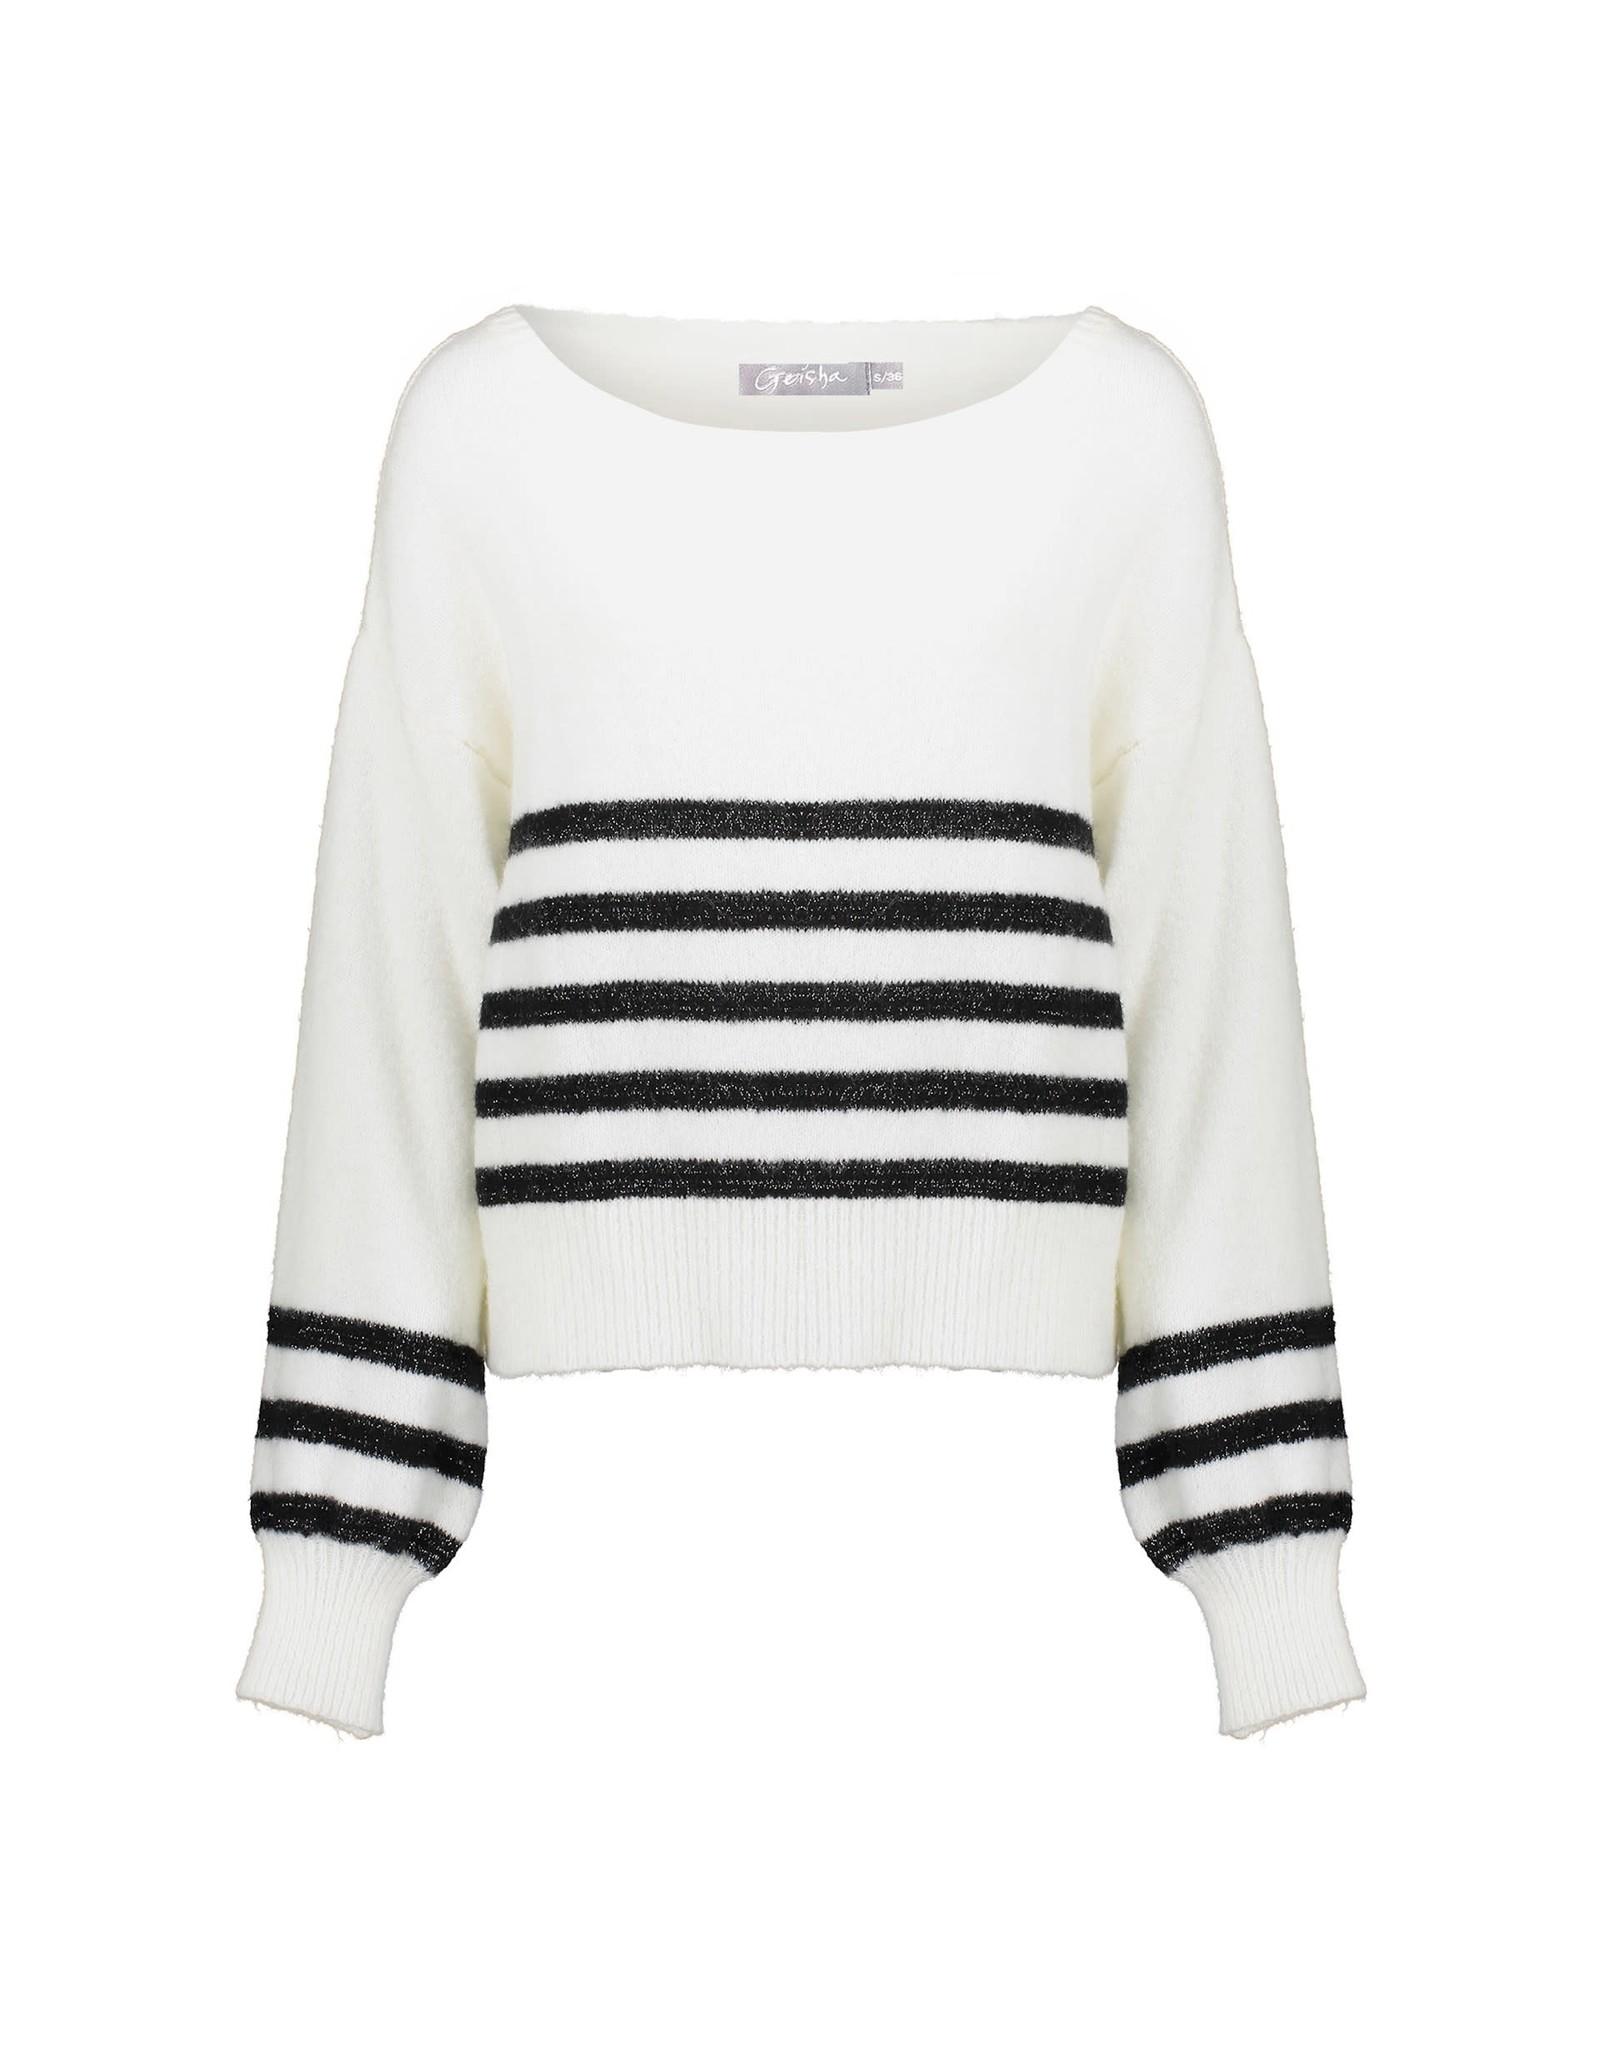 Geisha Geisha knitted wit zwarte trui